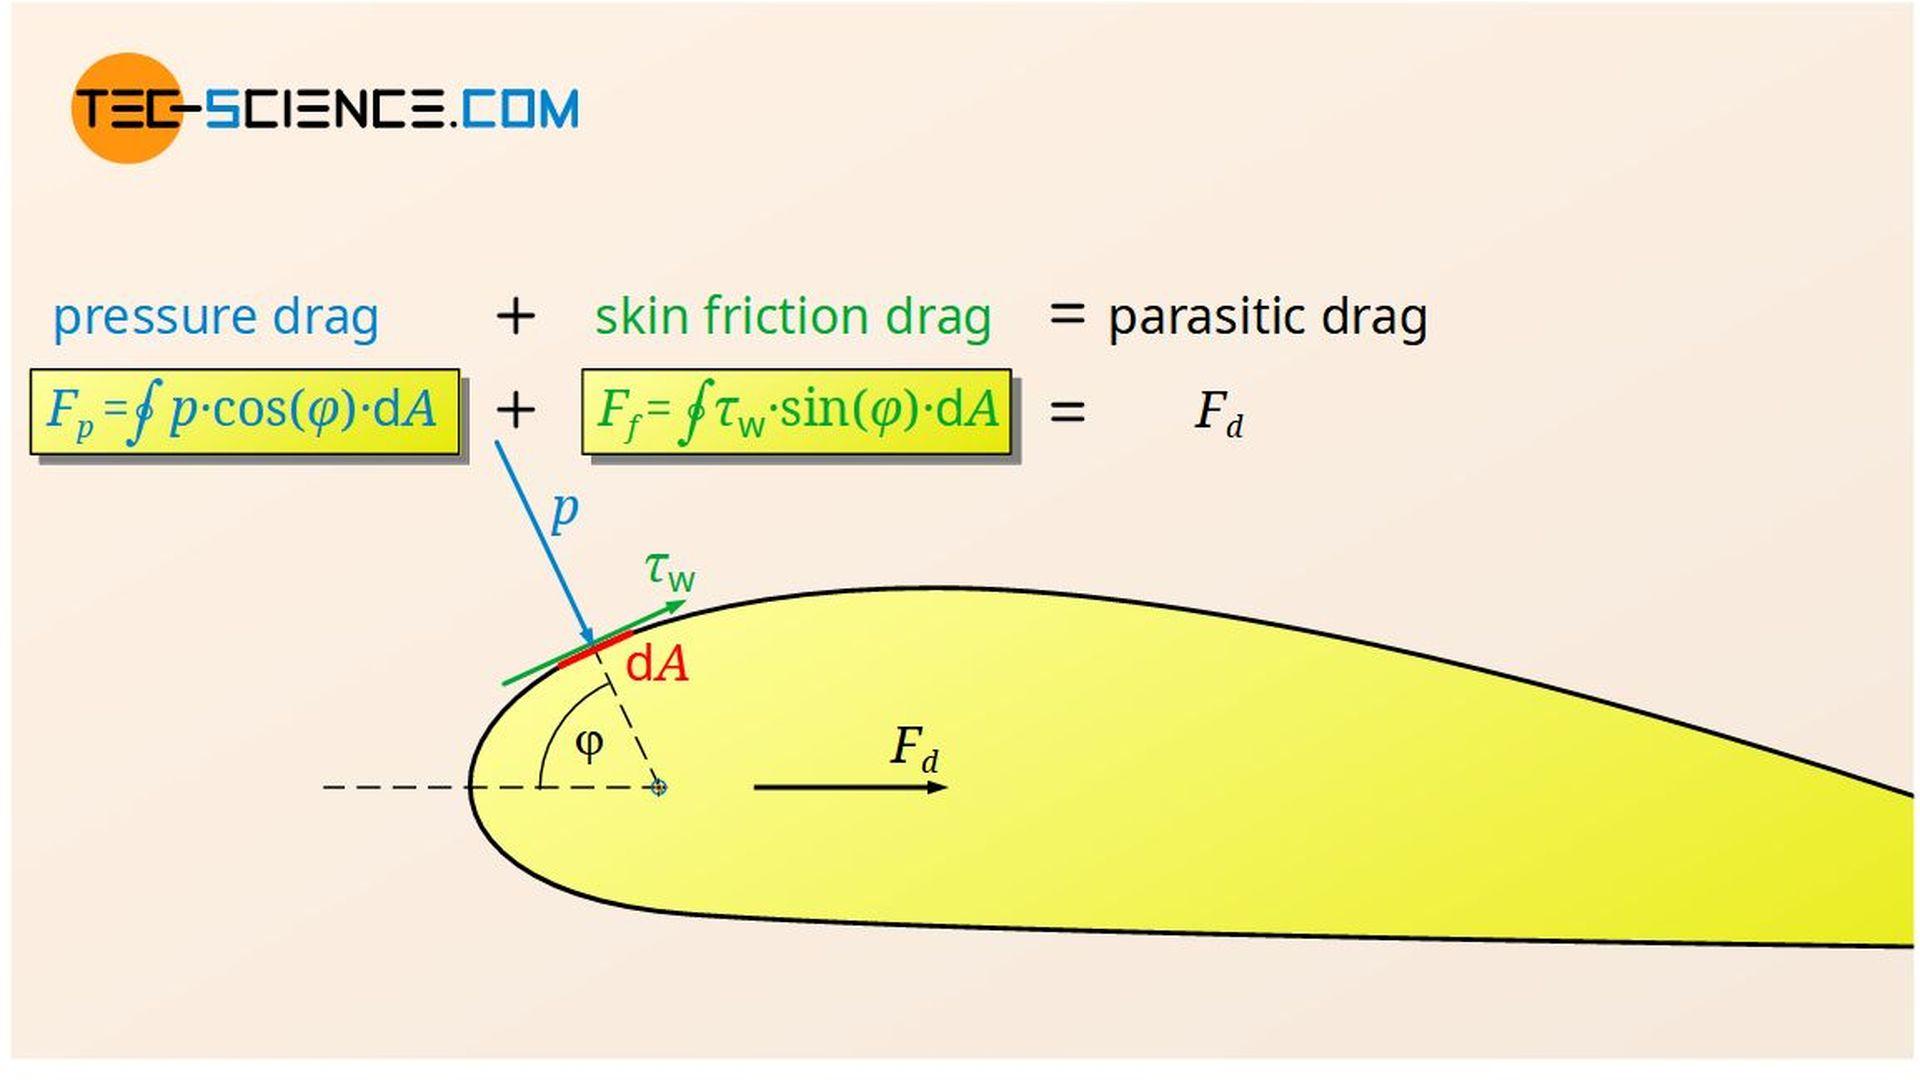 Relationship between parasitic drag, pressure drag and skin friction drag